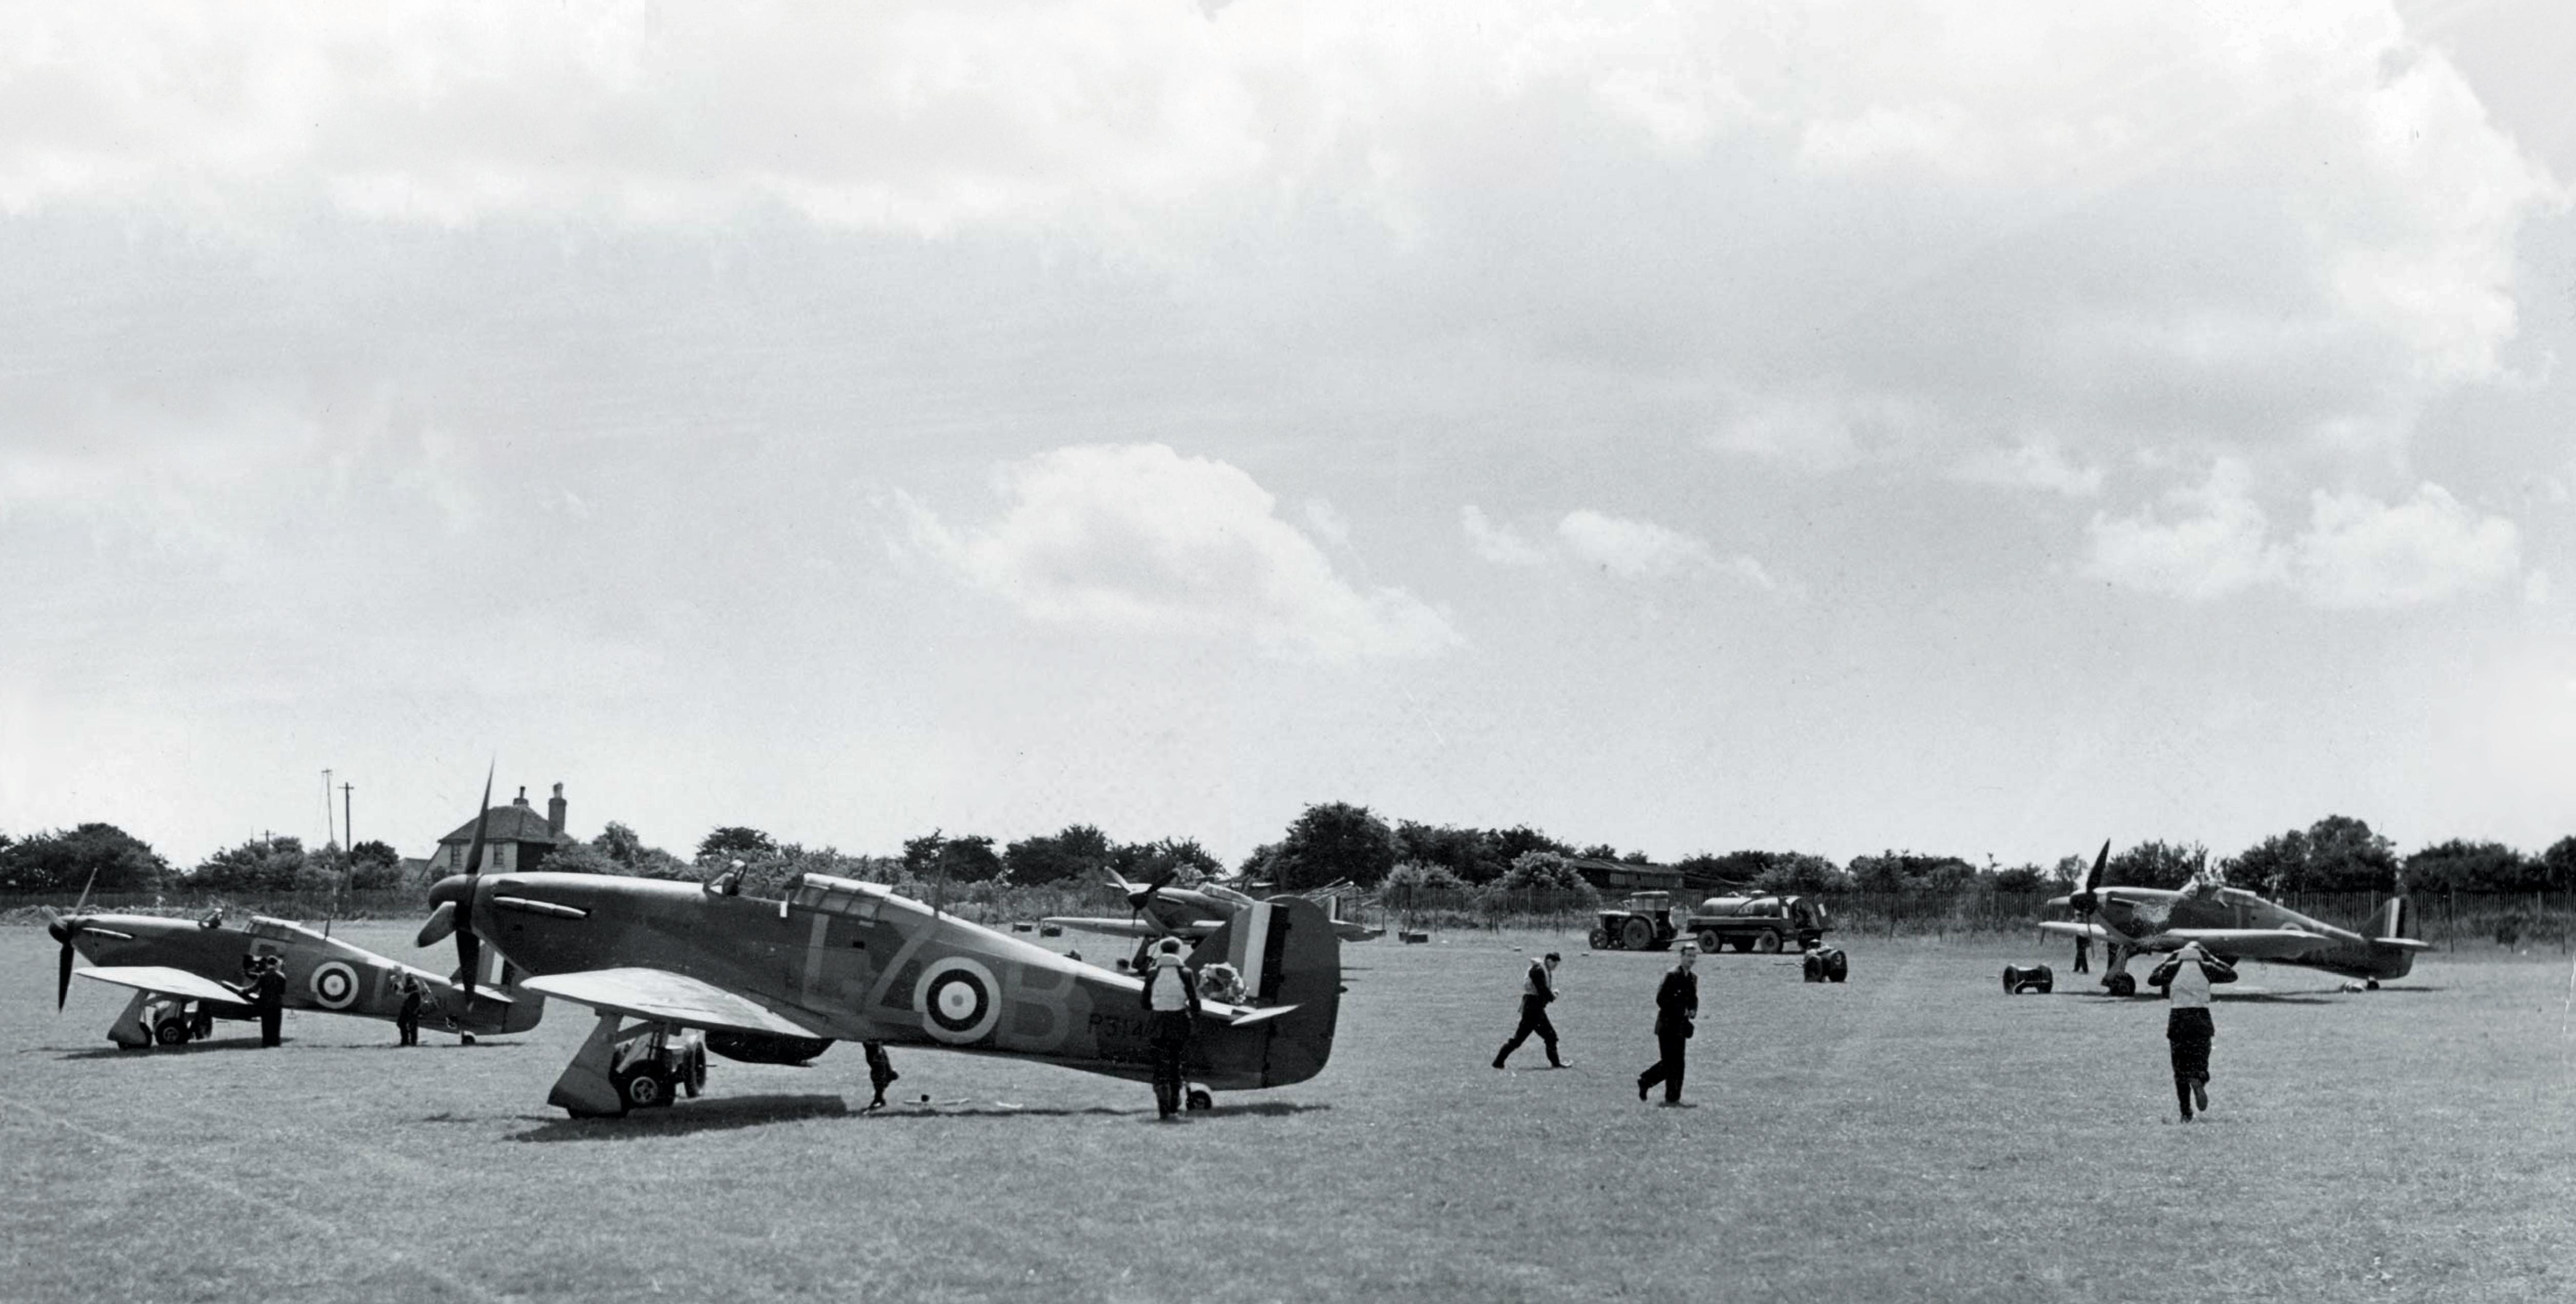 Hurricane I RAF 32Sqn GZB P3144 CZK GZT Biggin Hill England July 1940 01